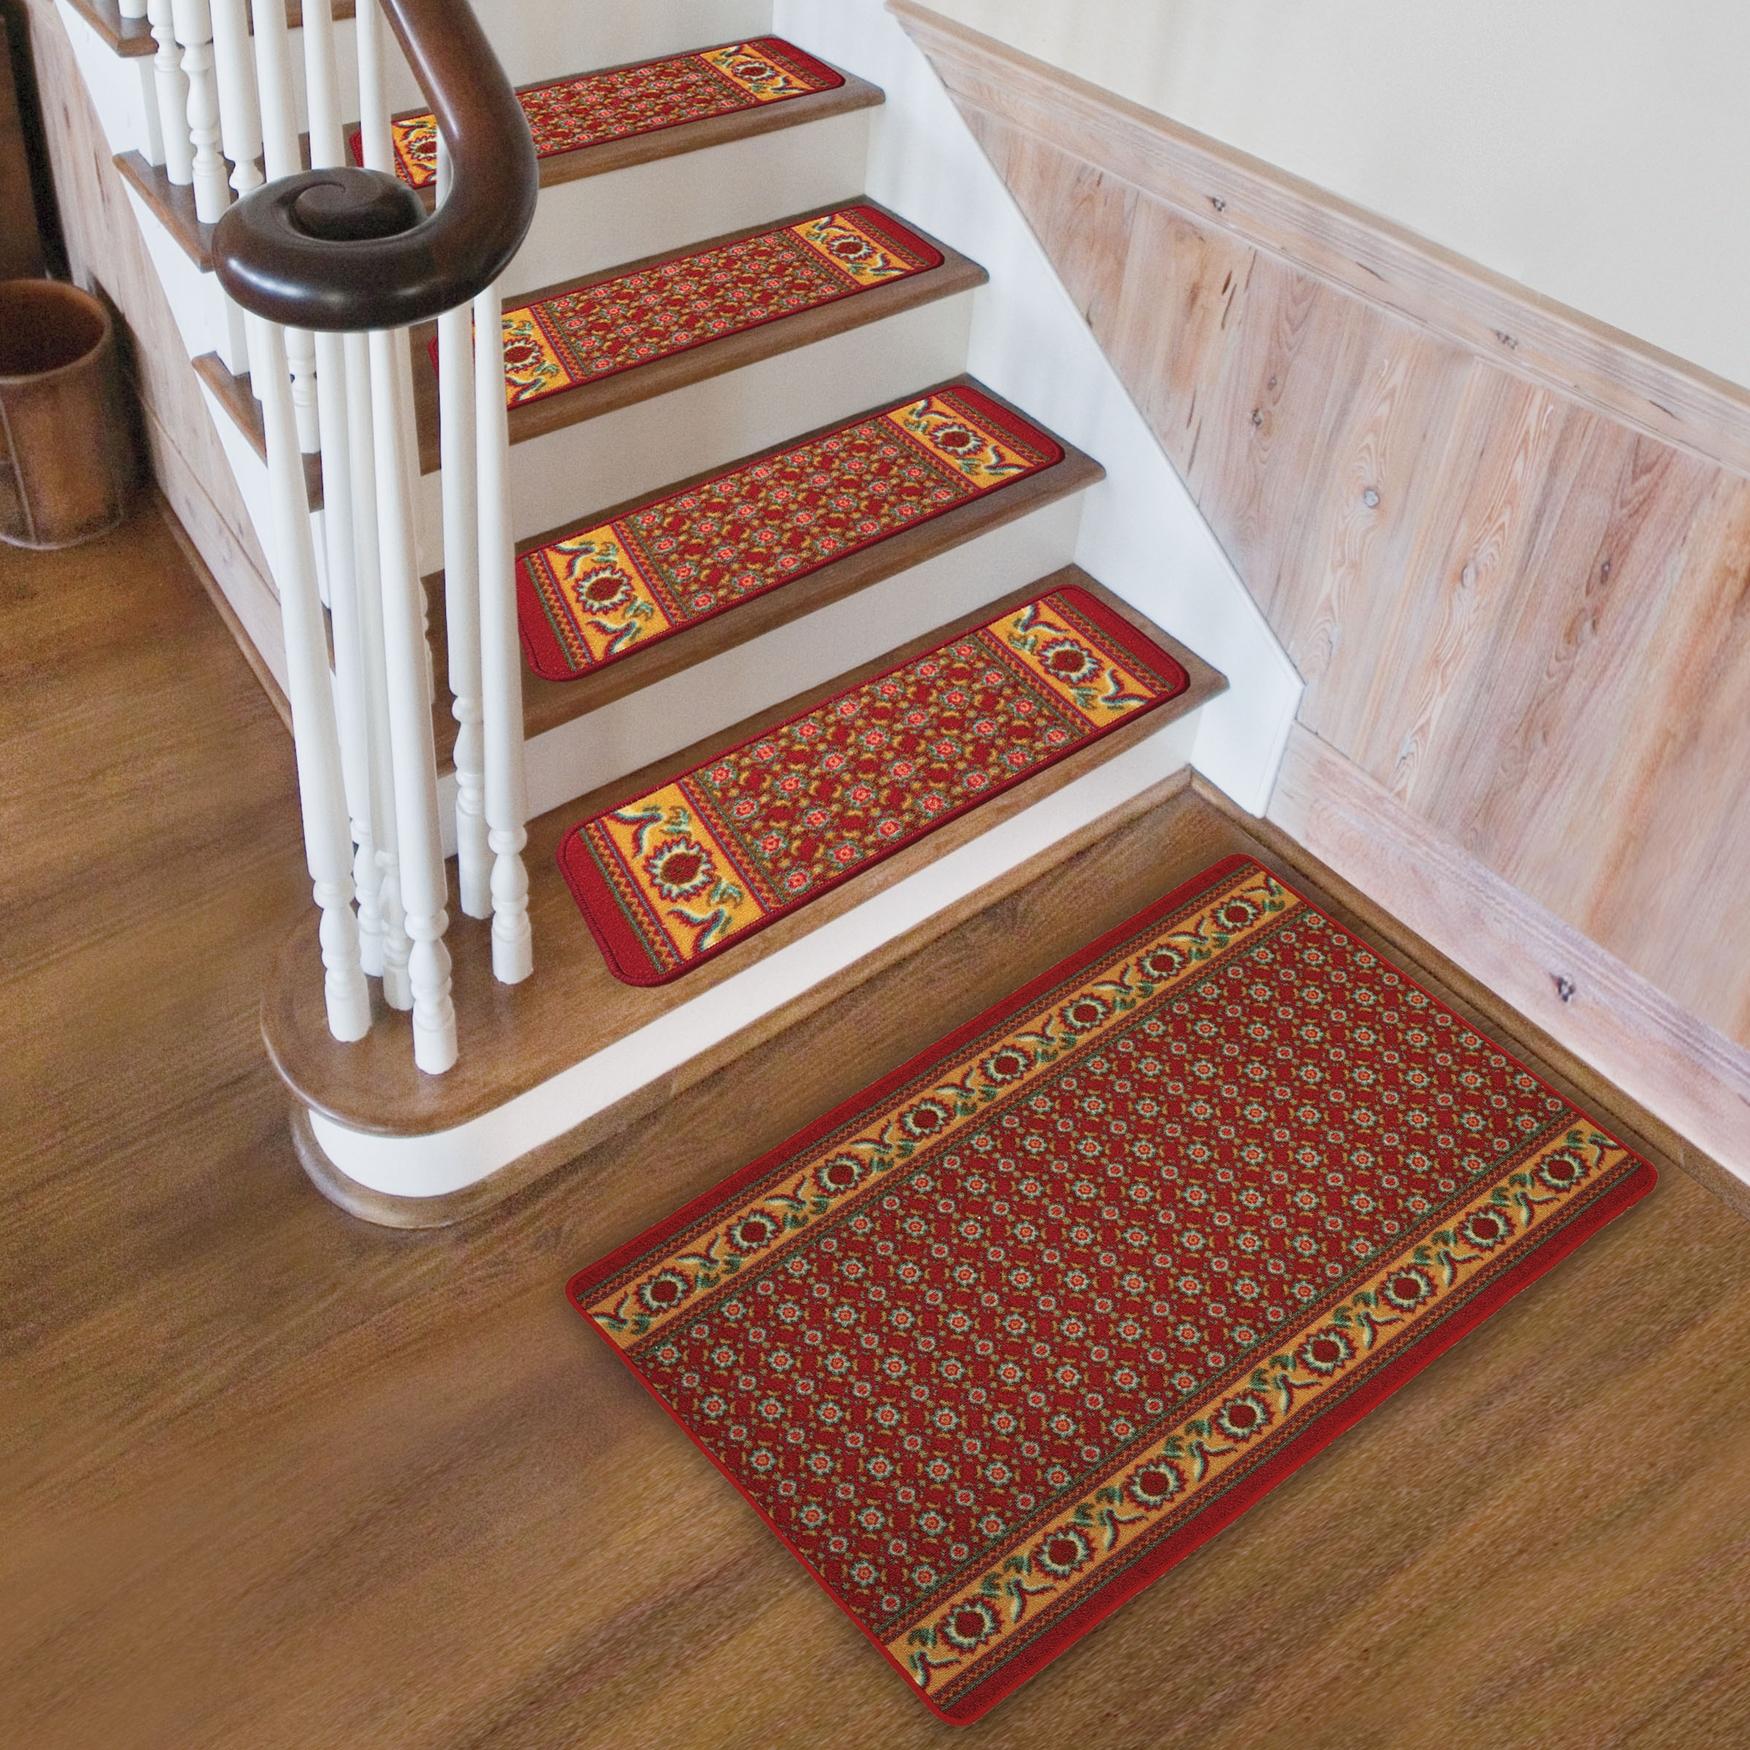 Oriental Carpet Stair Treads Best Carpet Stair Treads Ideas For Oriental Carpet  Stair Treads (#